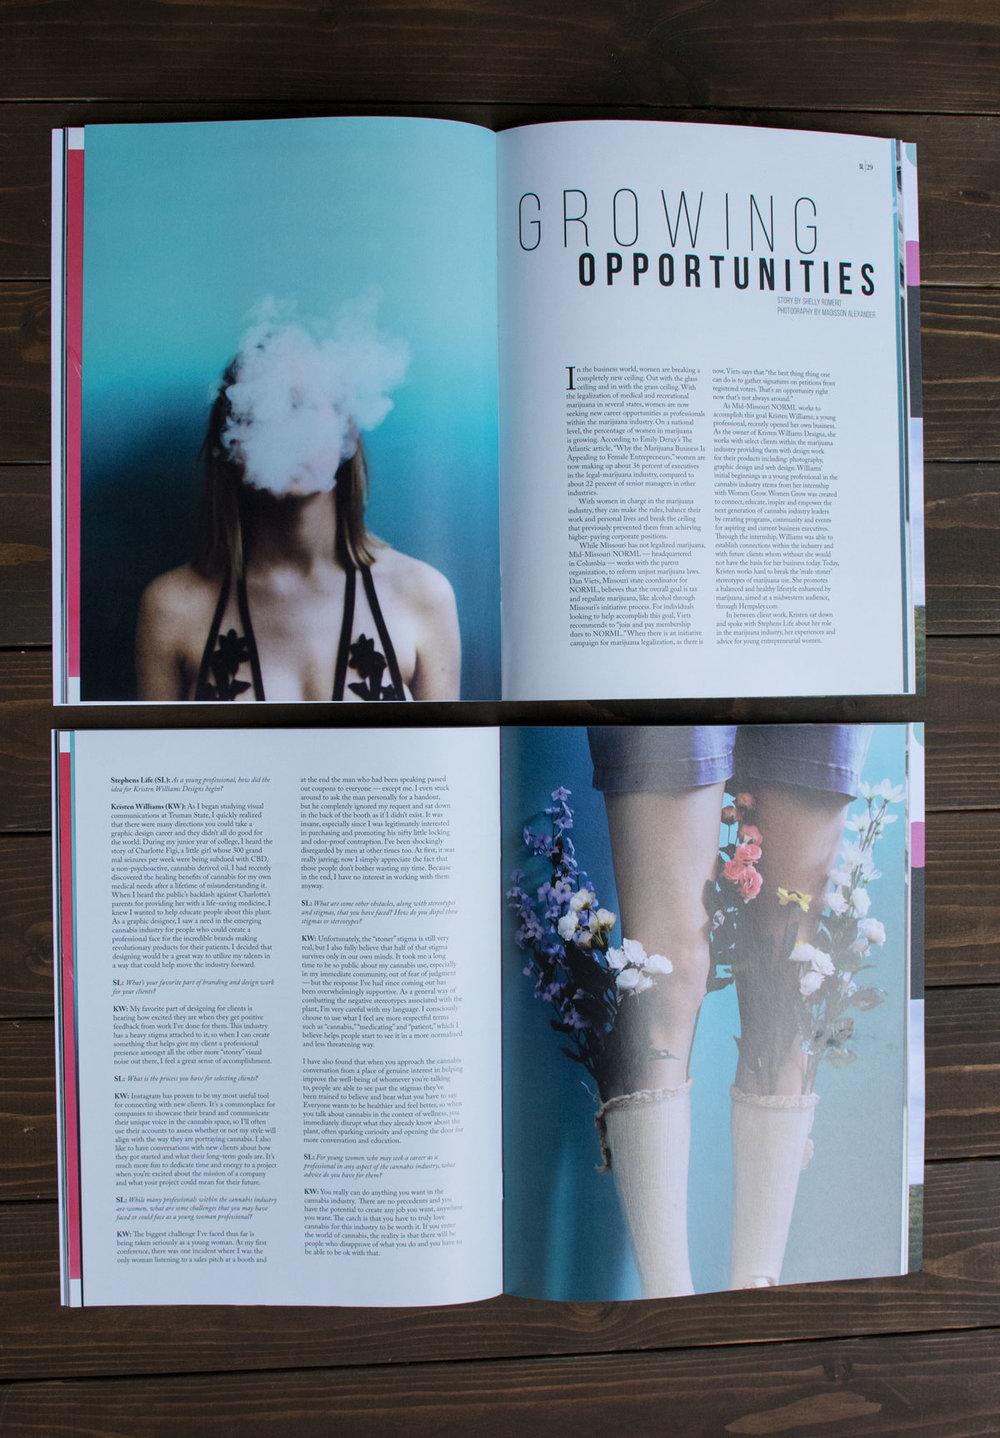 stephens-life-interview-kristen-williams-designs